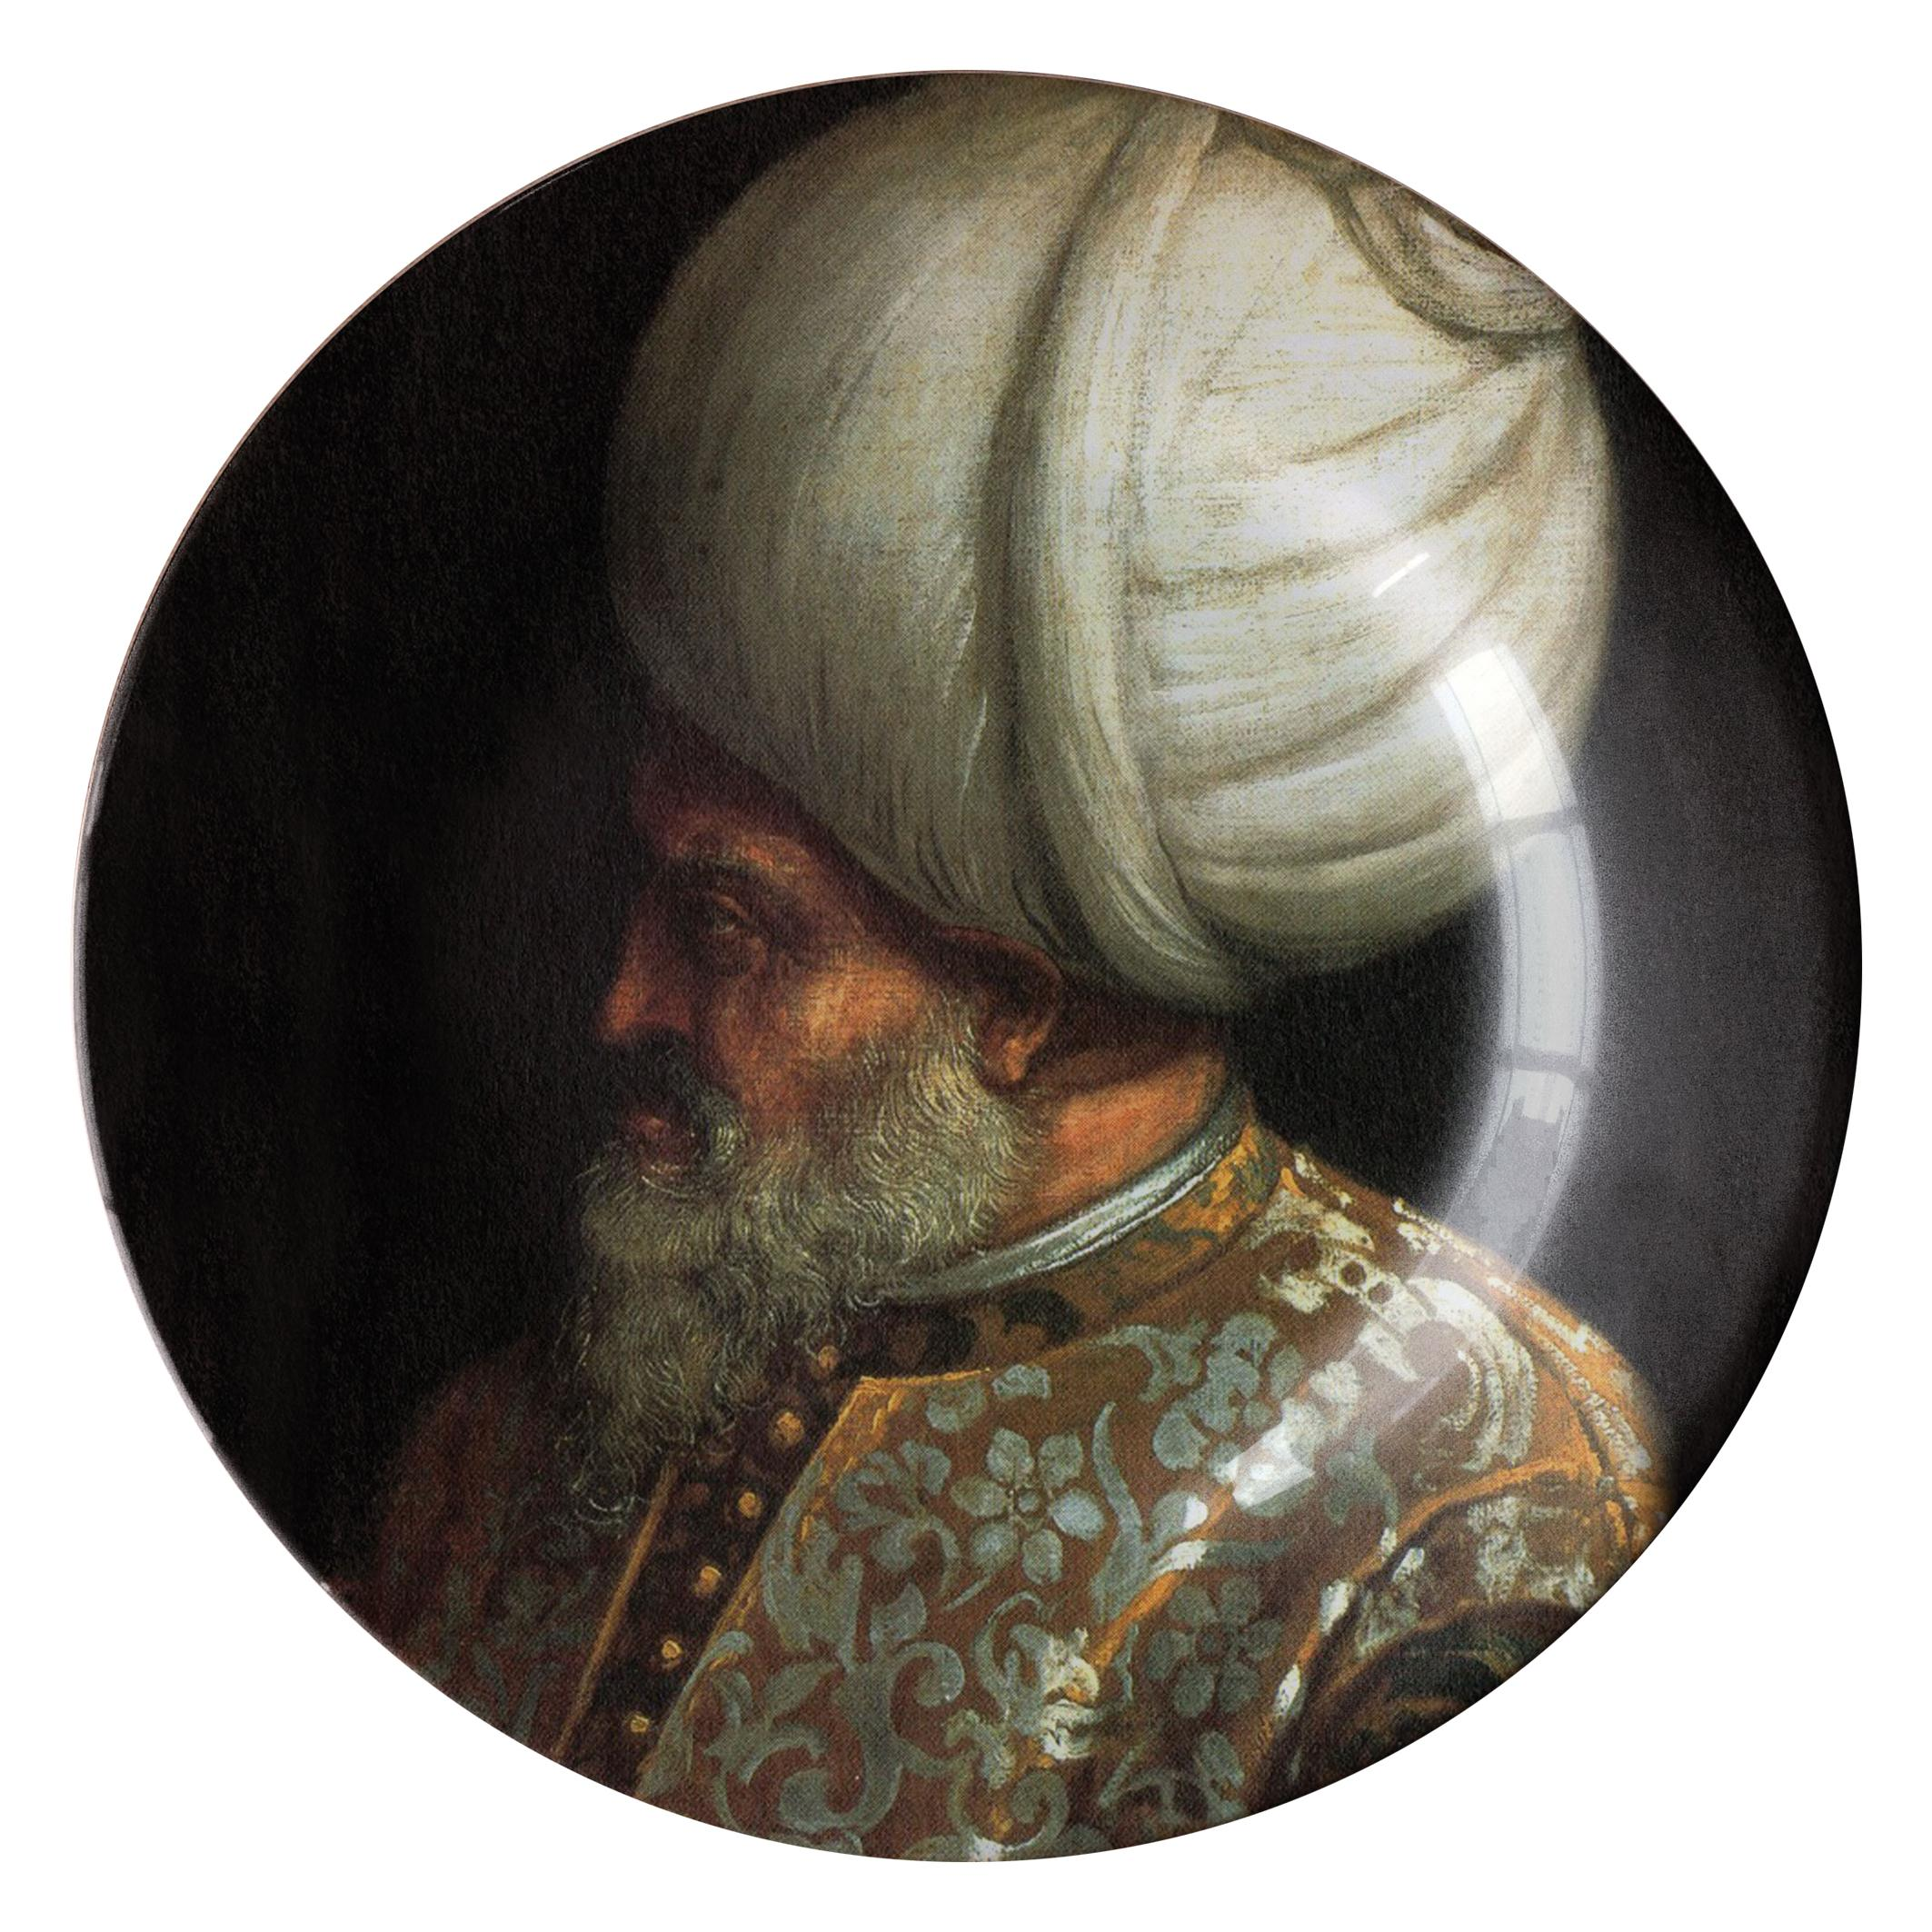 Handmade Sultan Beyazit Ceramic Plate